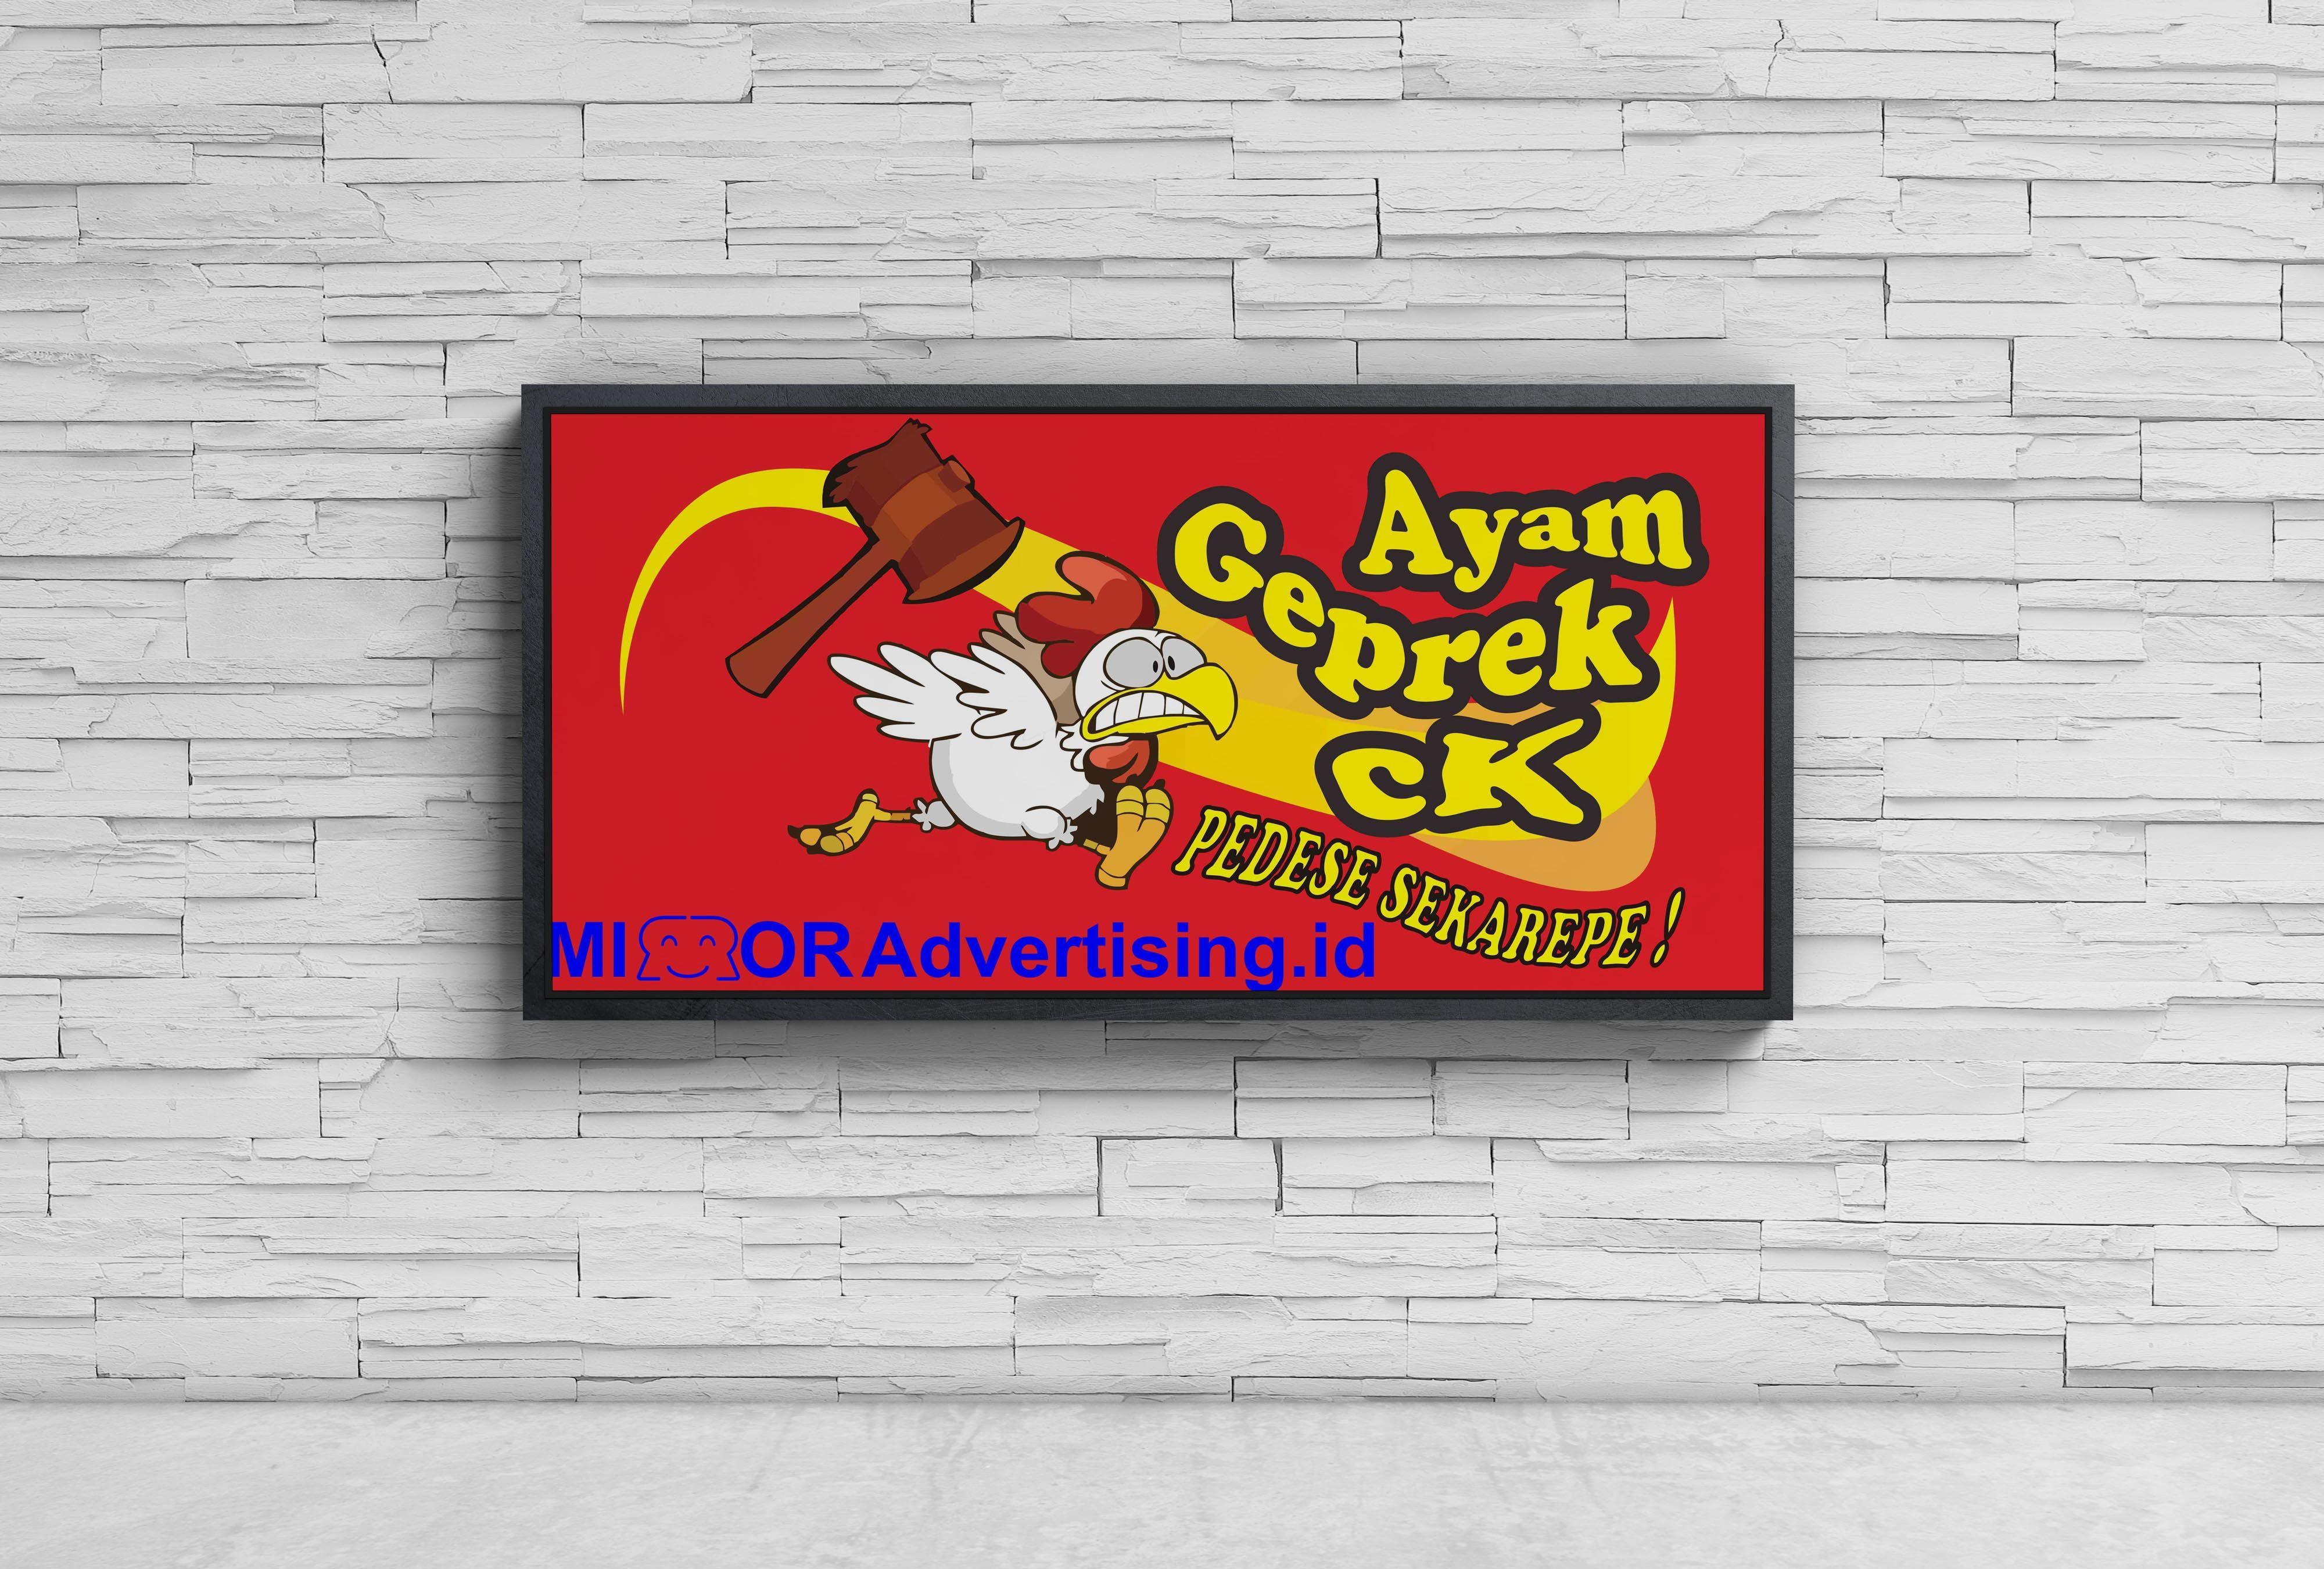 Banner Ayam Geprek Ck Ayam